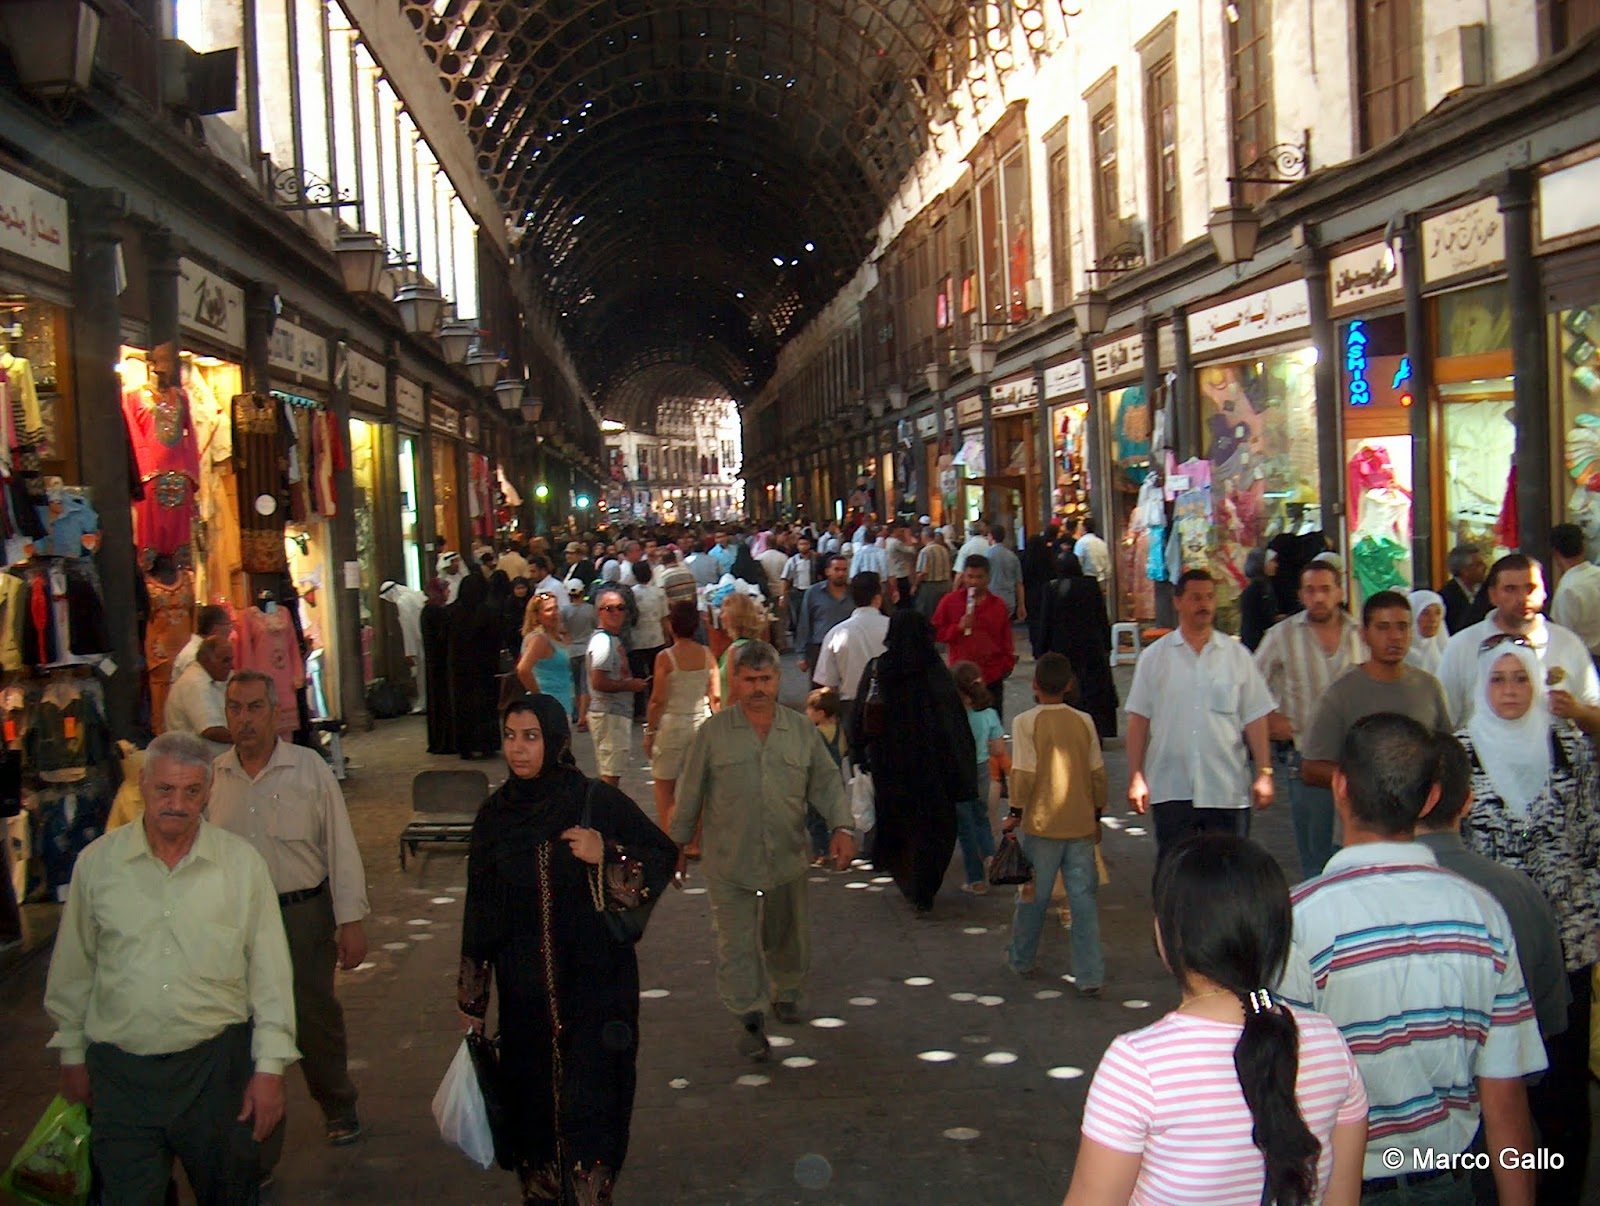 Vivir viajando: Zoco Al-Hamadiyya, Damasco. Siria.